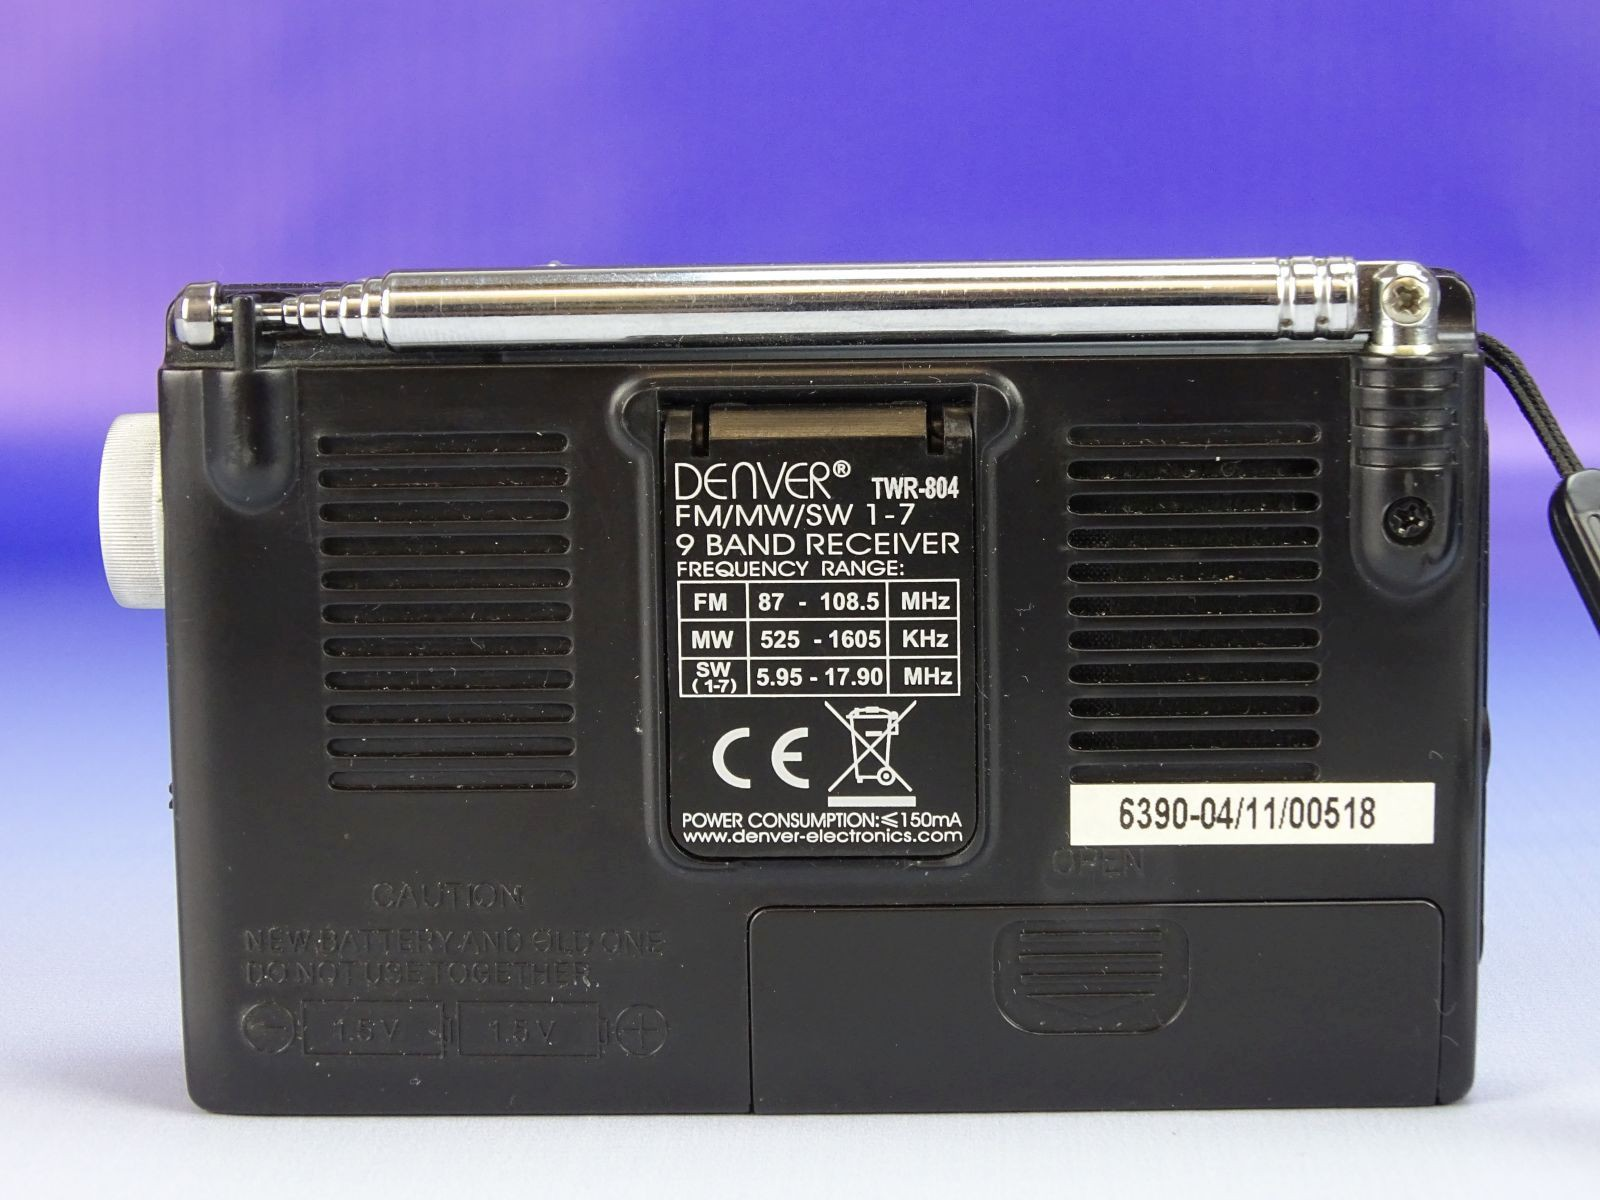 DSC02955.JPG (1600�1200)